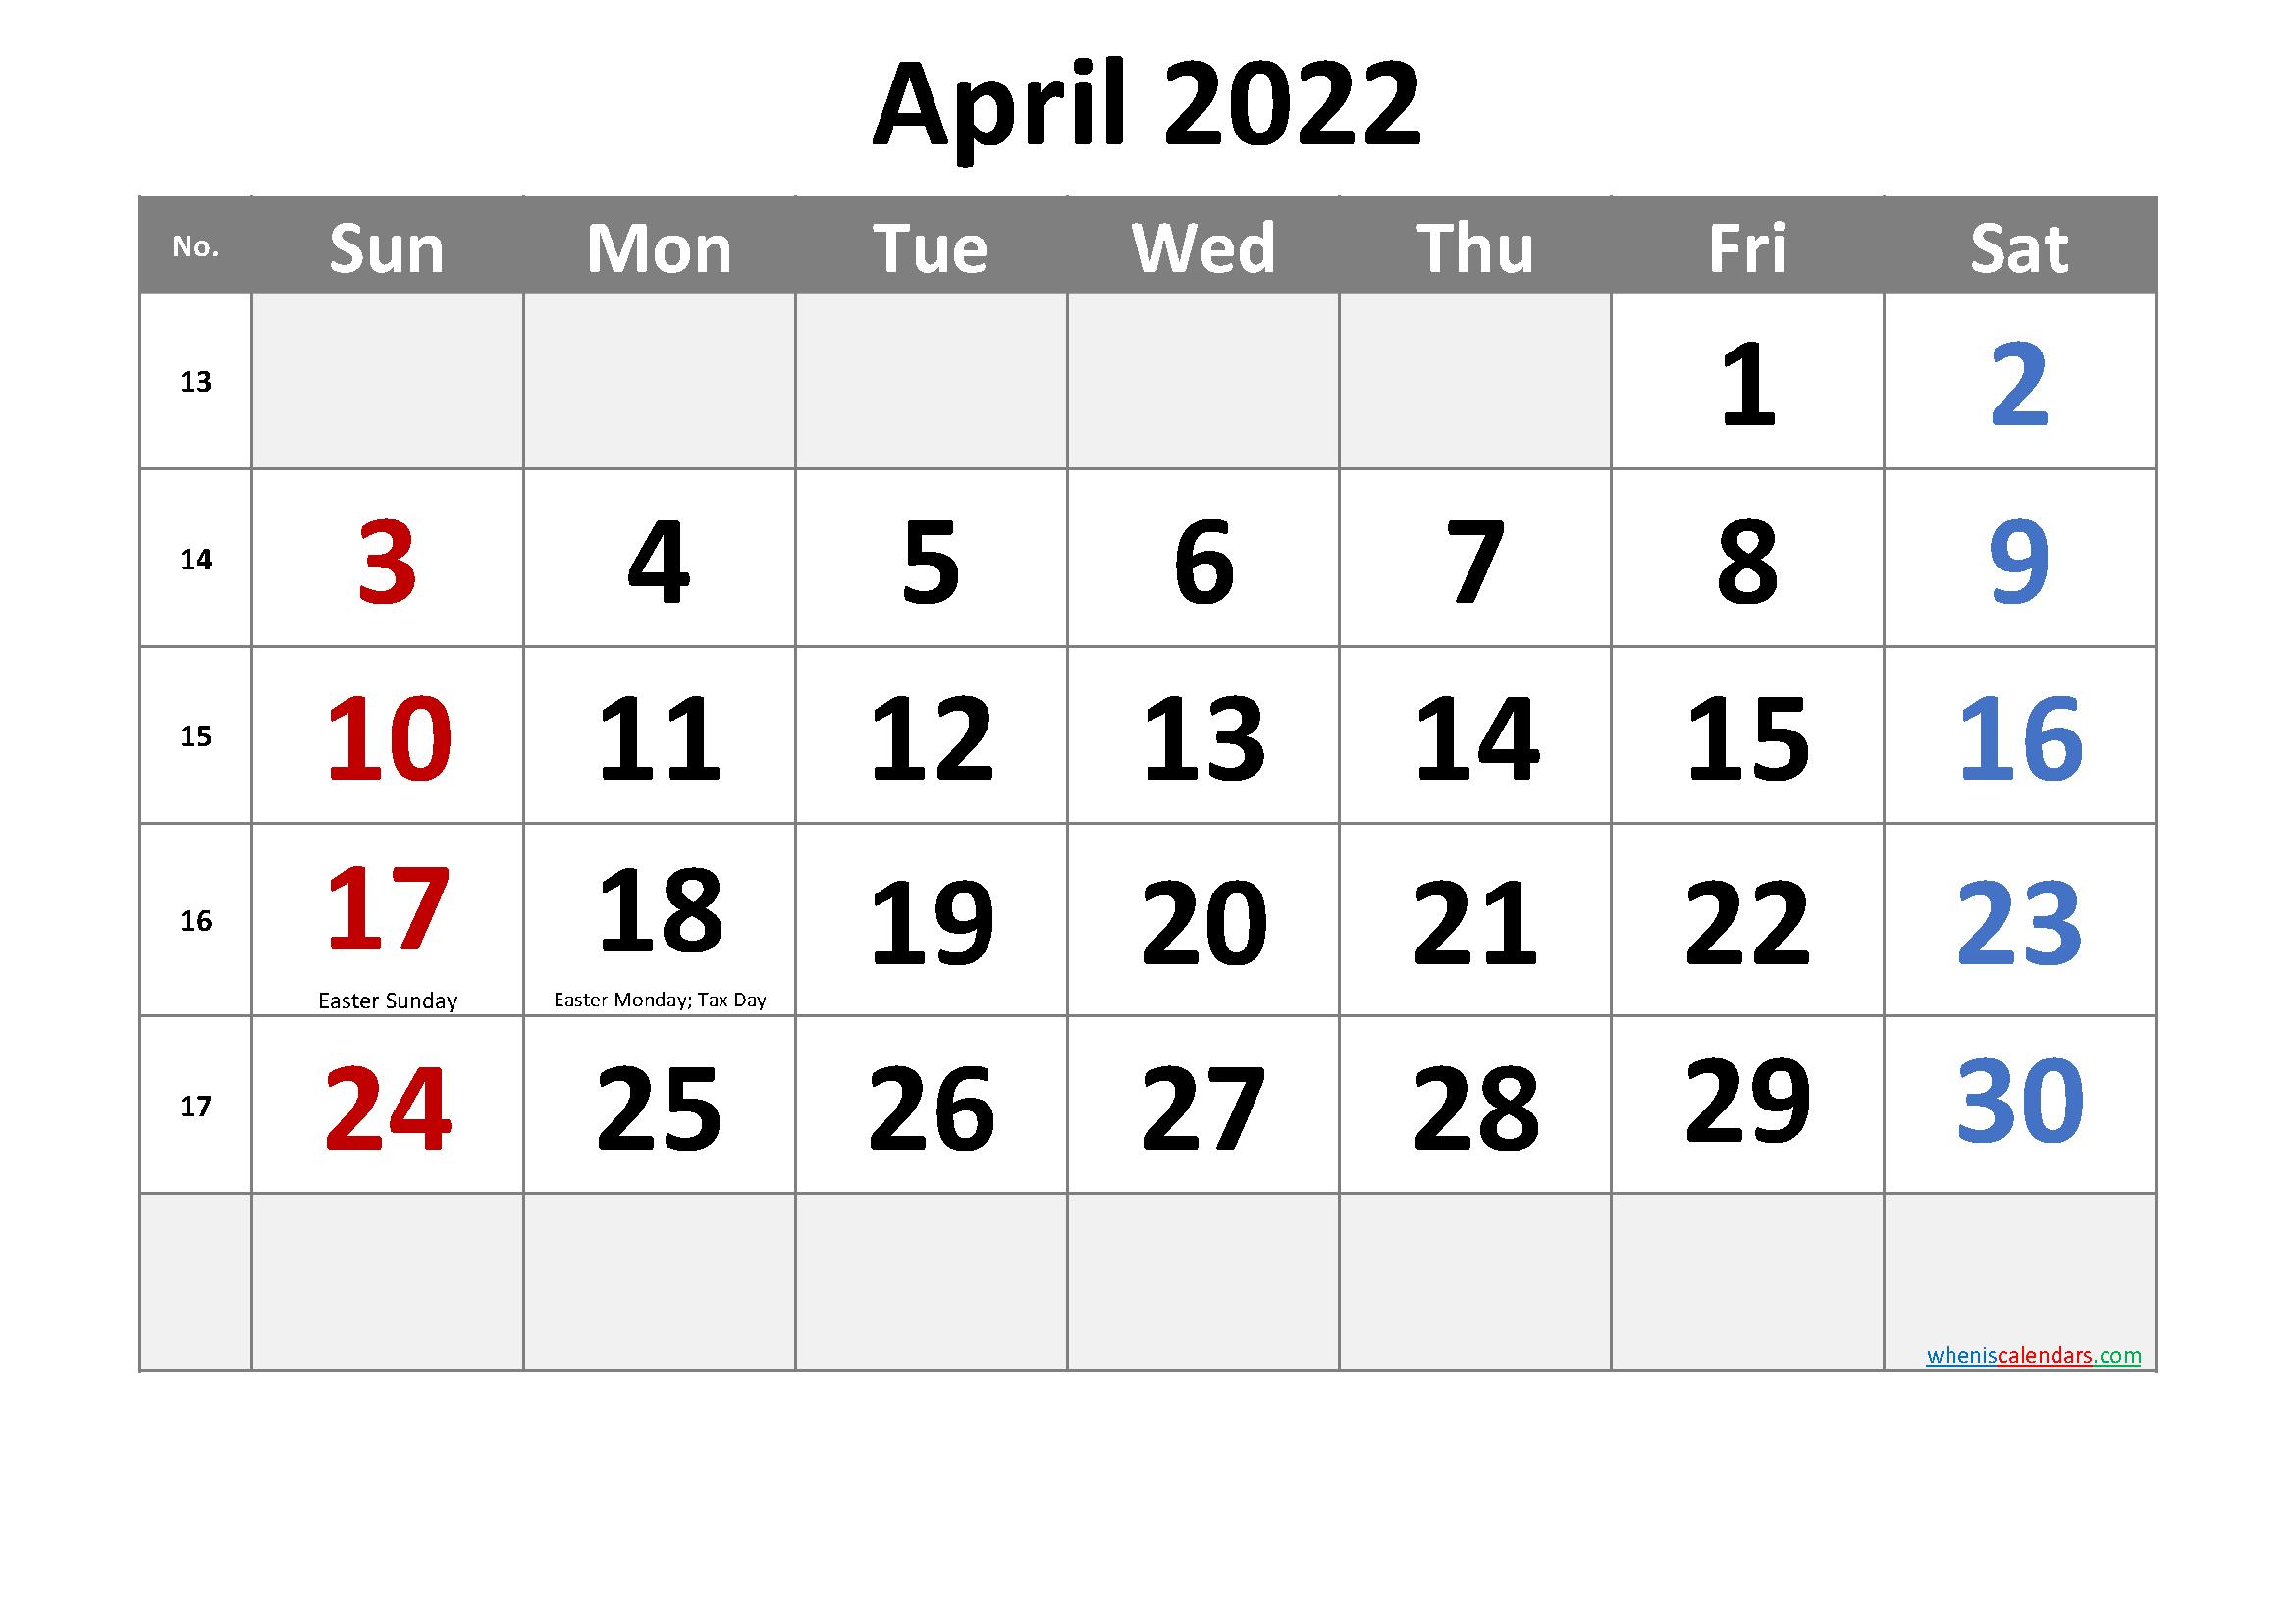 Free Printable April 2022 Calendar With Holidays With Regard To March & April 2022 Calendar Free Printable